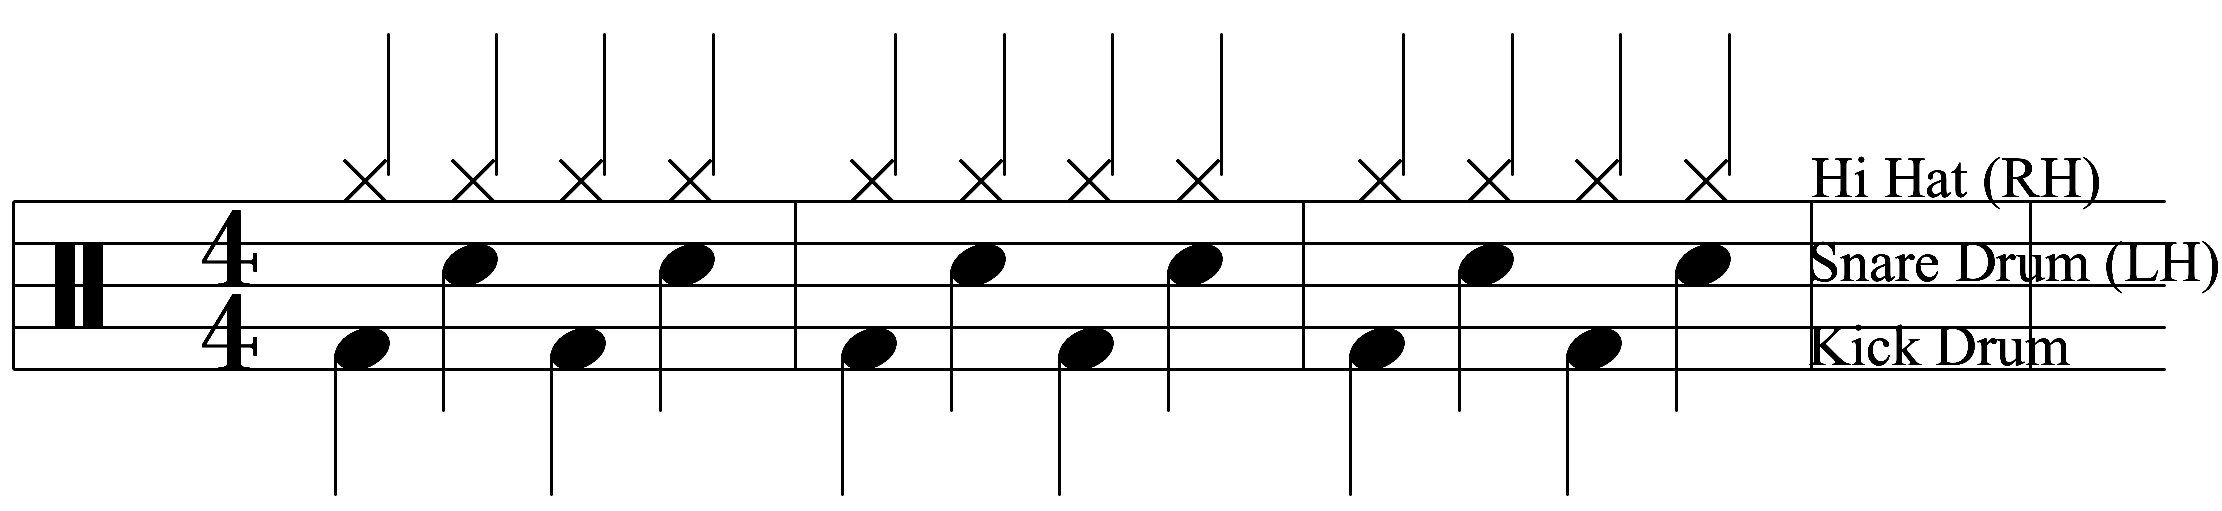 Drum Timing | drumlessonsbeginners com